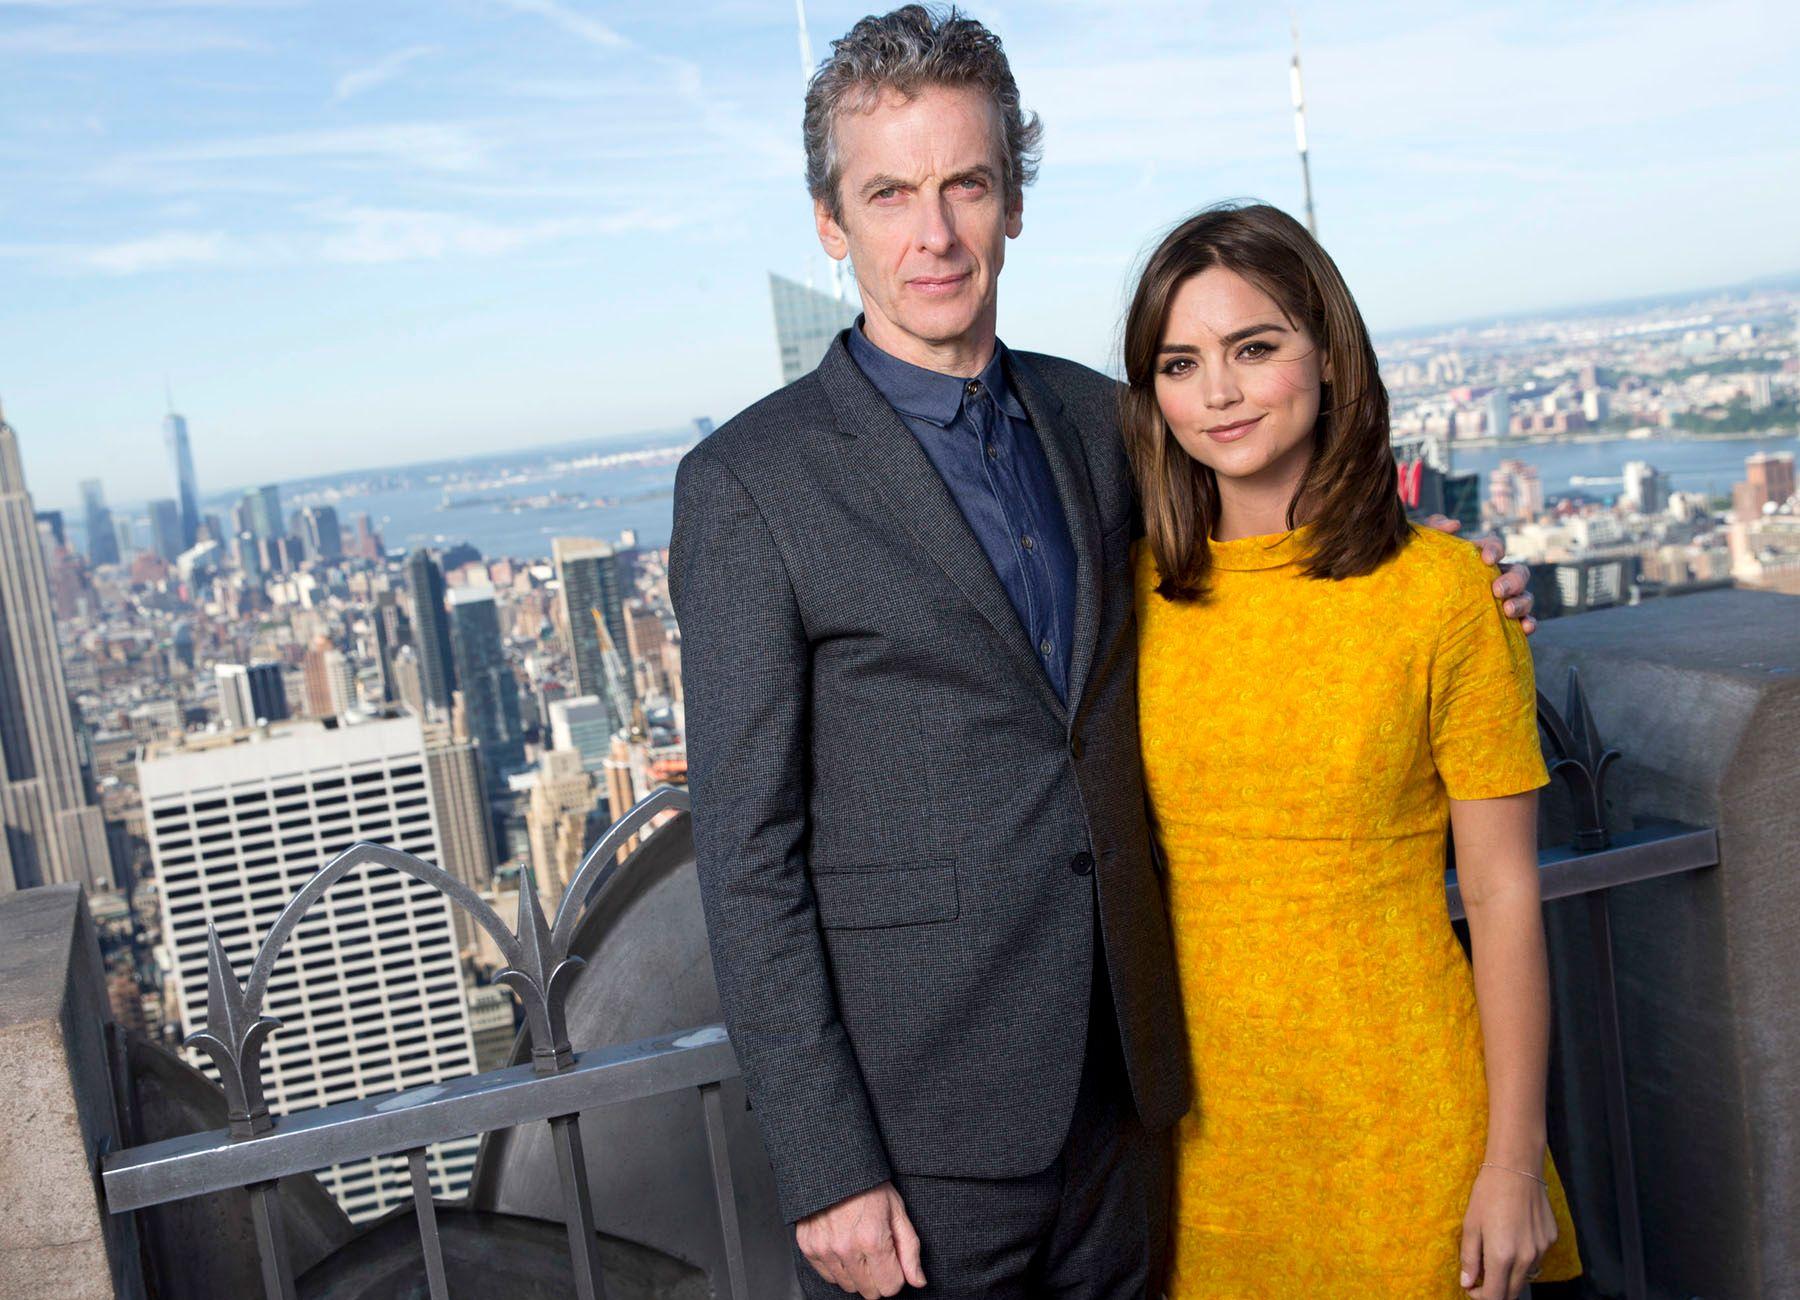 Steven Moffat Talks Sherlock Doctor Who Crossover & More | Collider